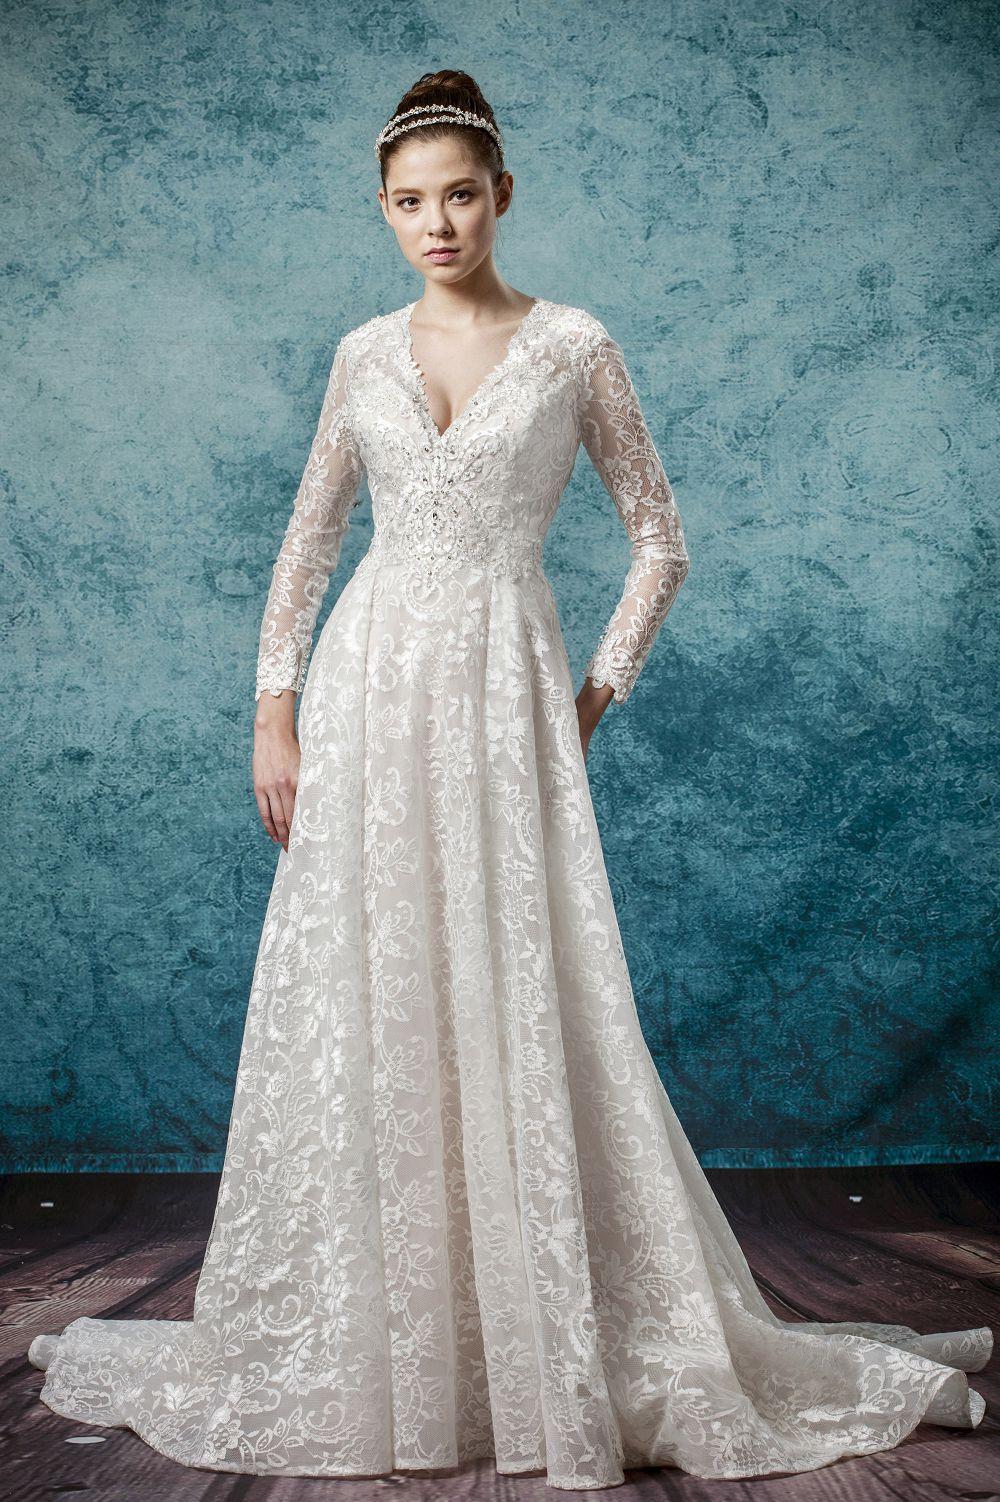 Modern Burlington Coat Factory Wedding Dresses Composition - All ...